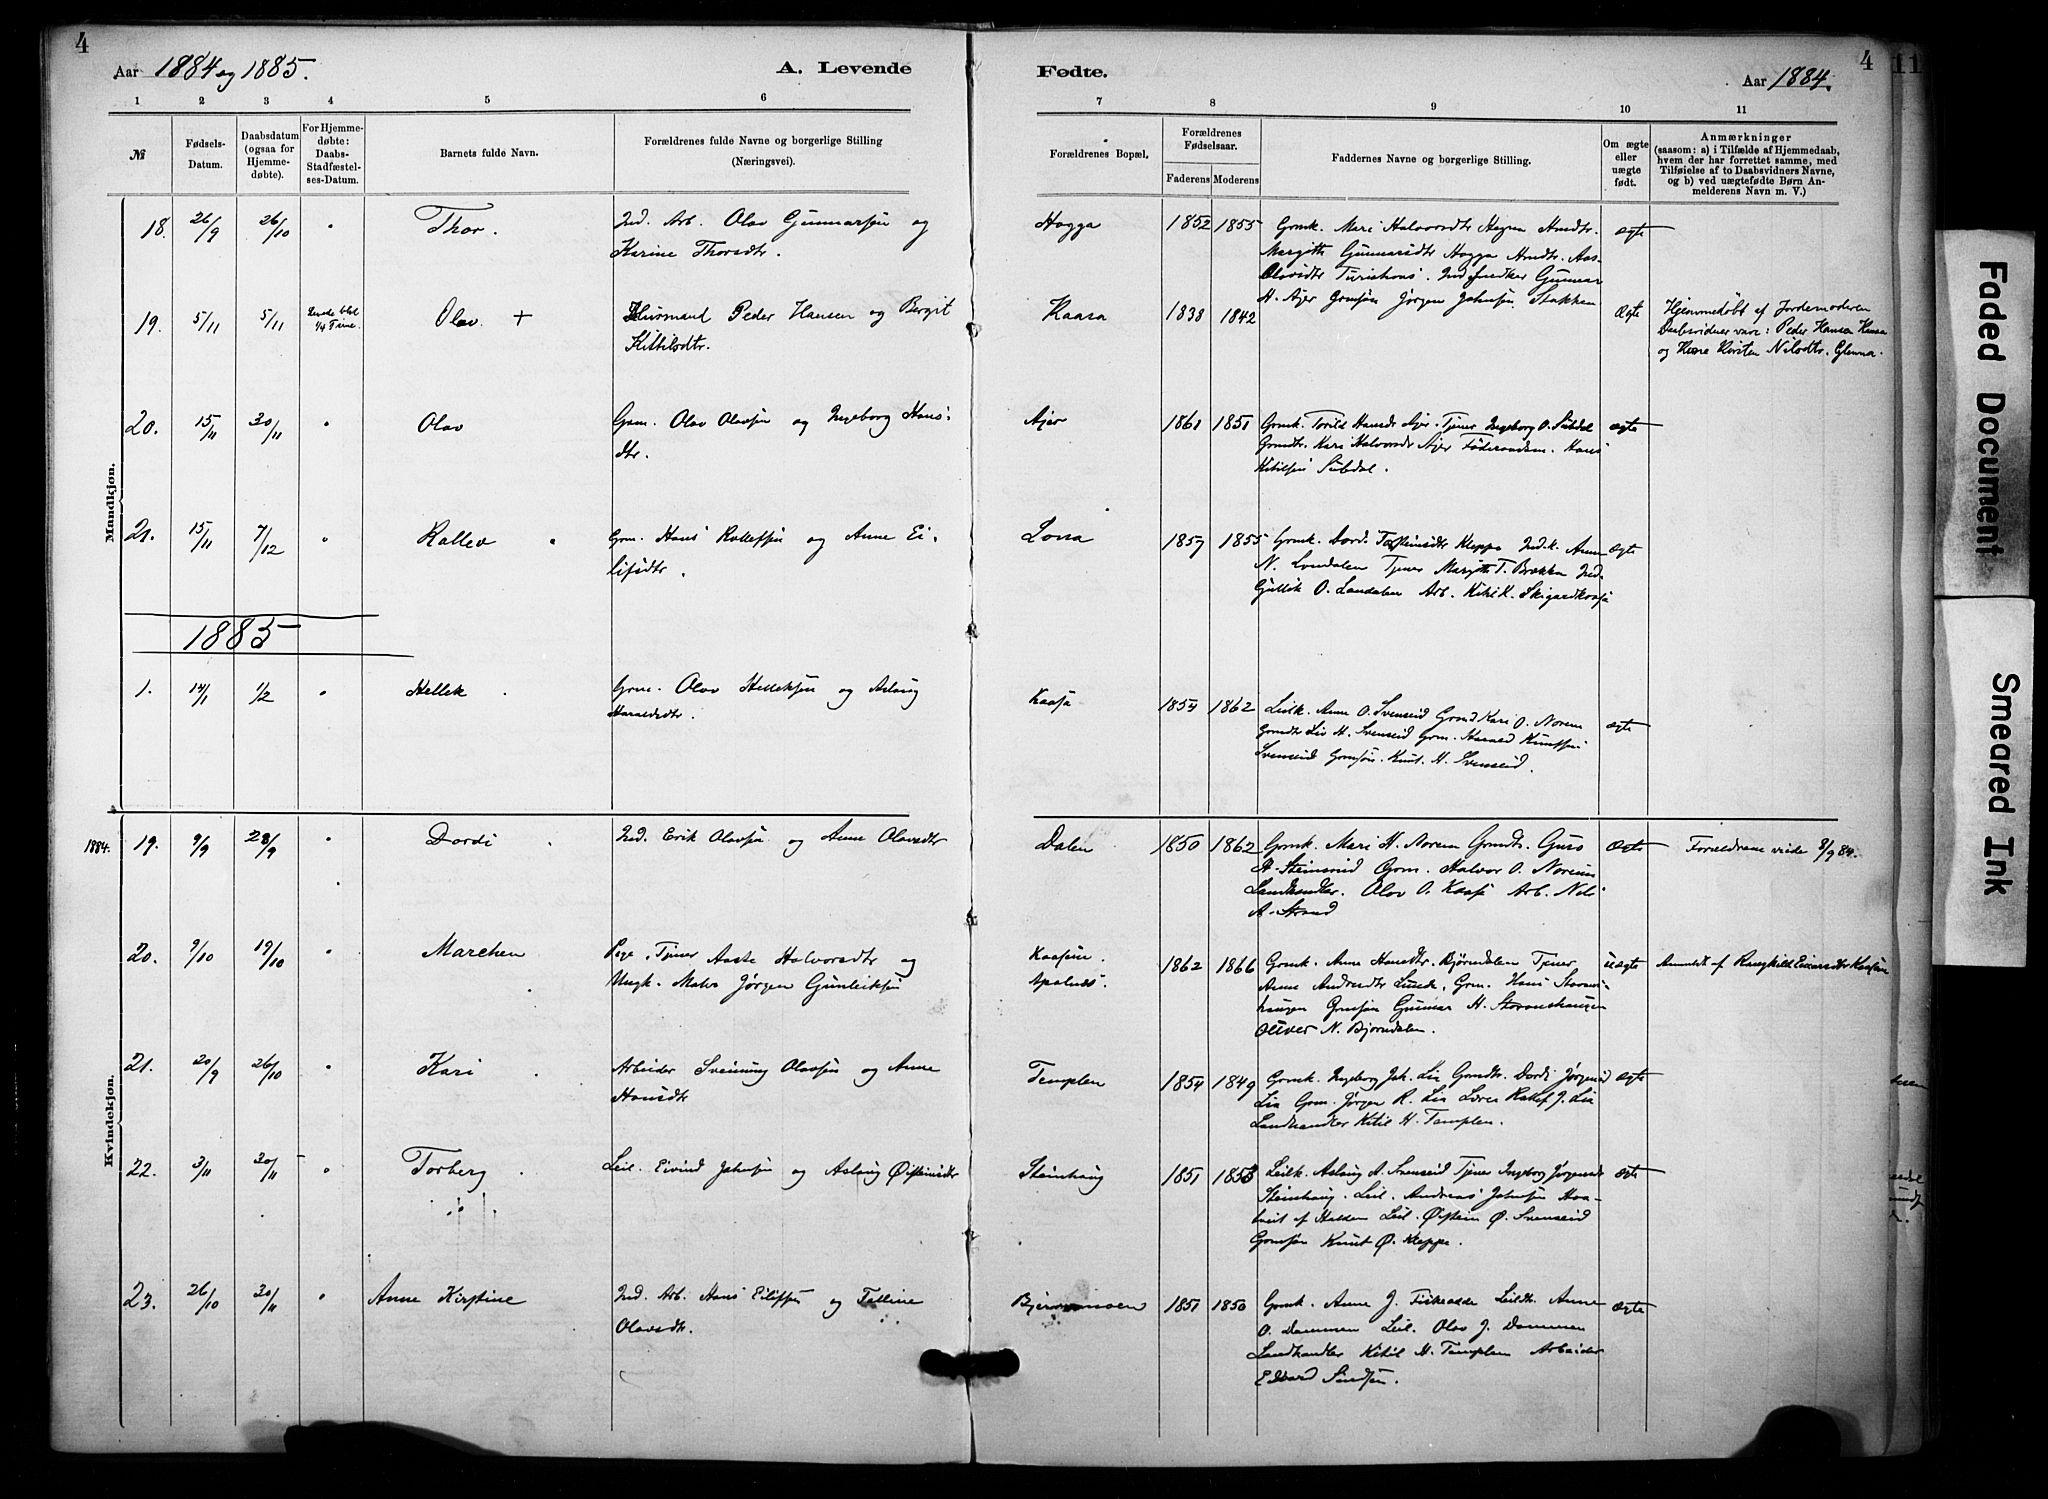 SAKO, Lunde kirkebøker, F/Fa/L0002: Ministerialbok nr. I 2, 1884-1892, s. 4